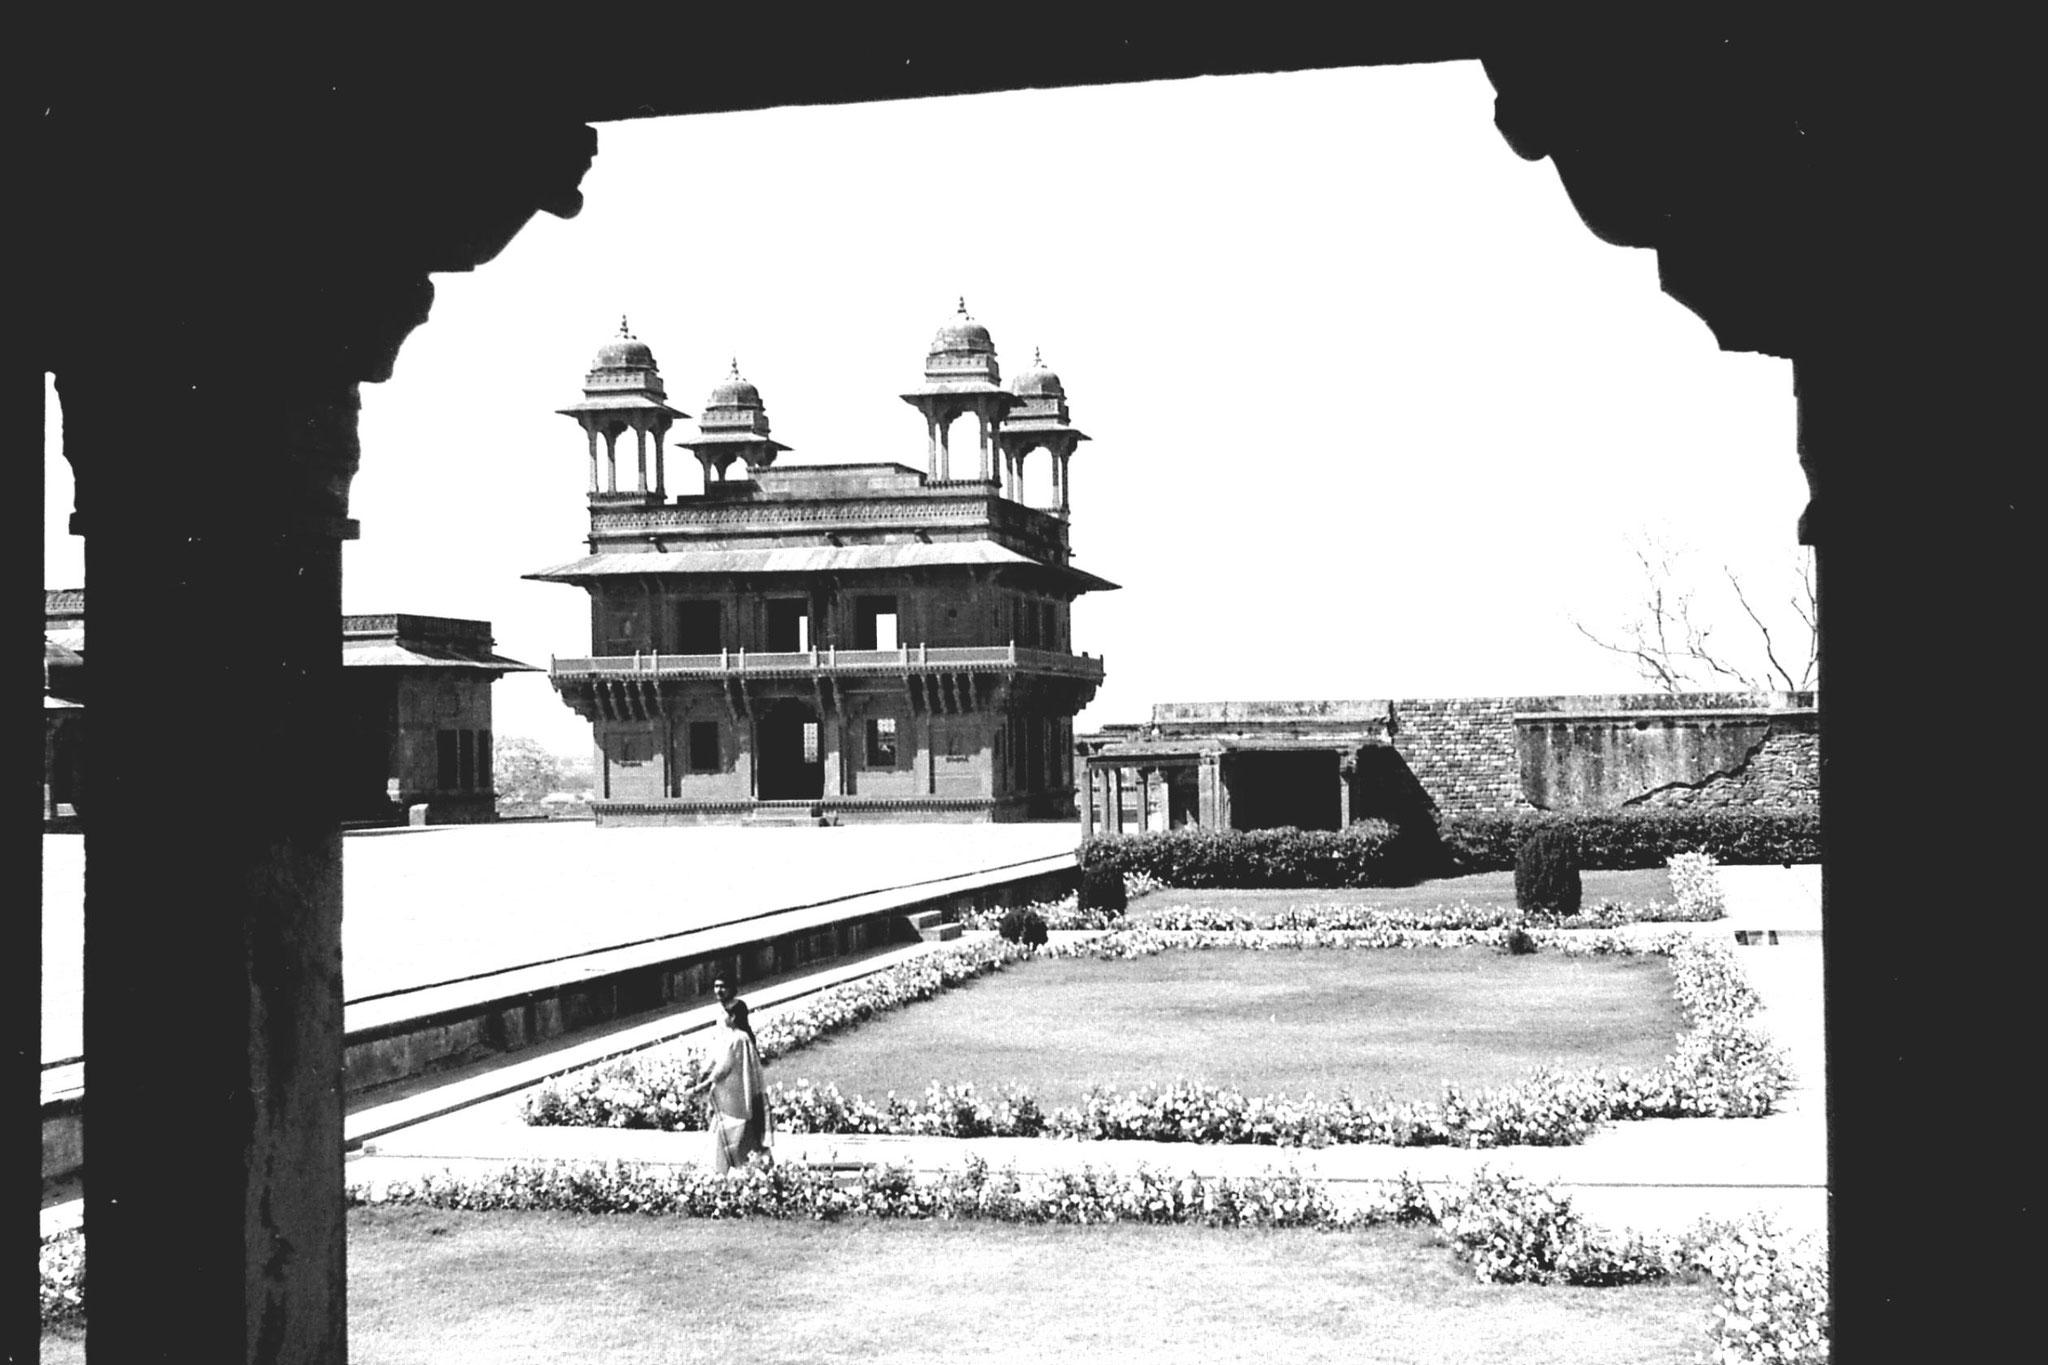 31/3/90: 35: Fatehpur Sikri: Diwan-i-khas from Turkish Sultana's house